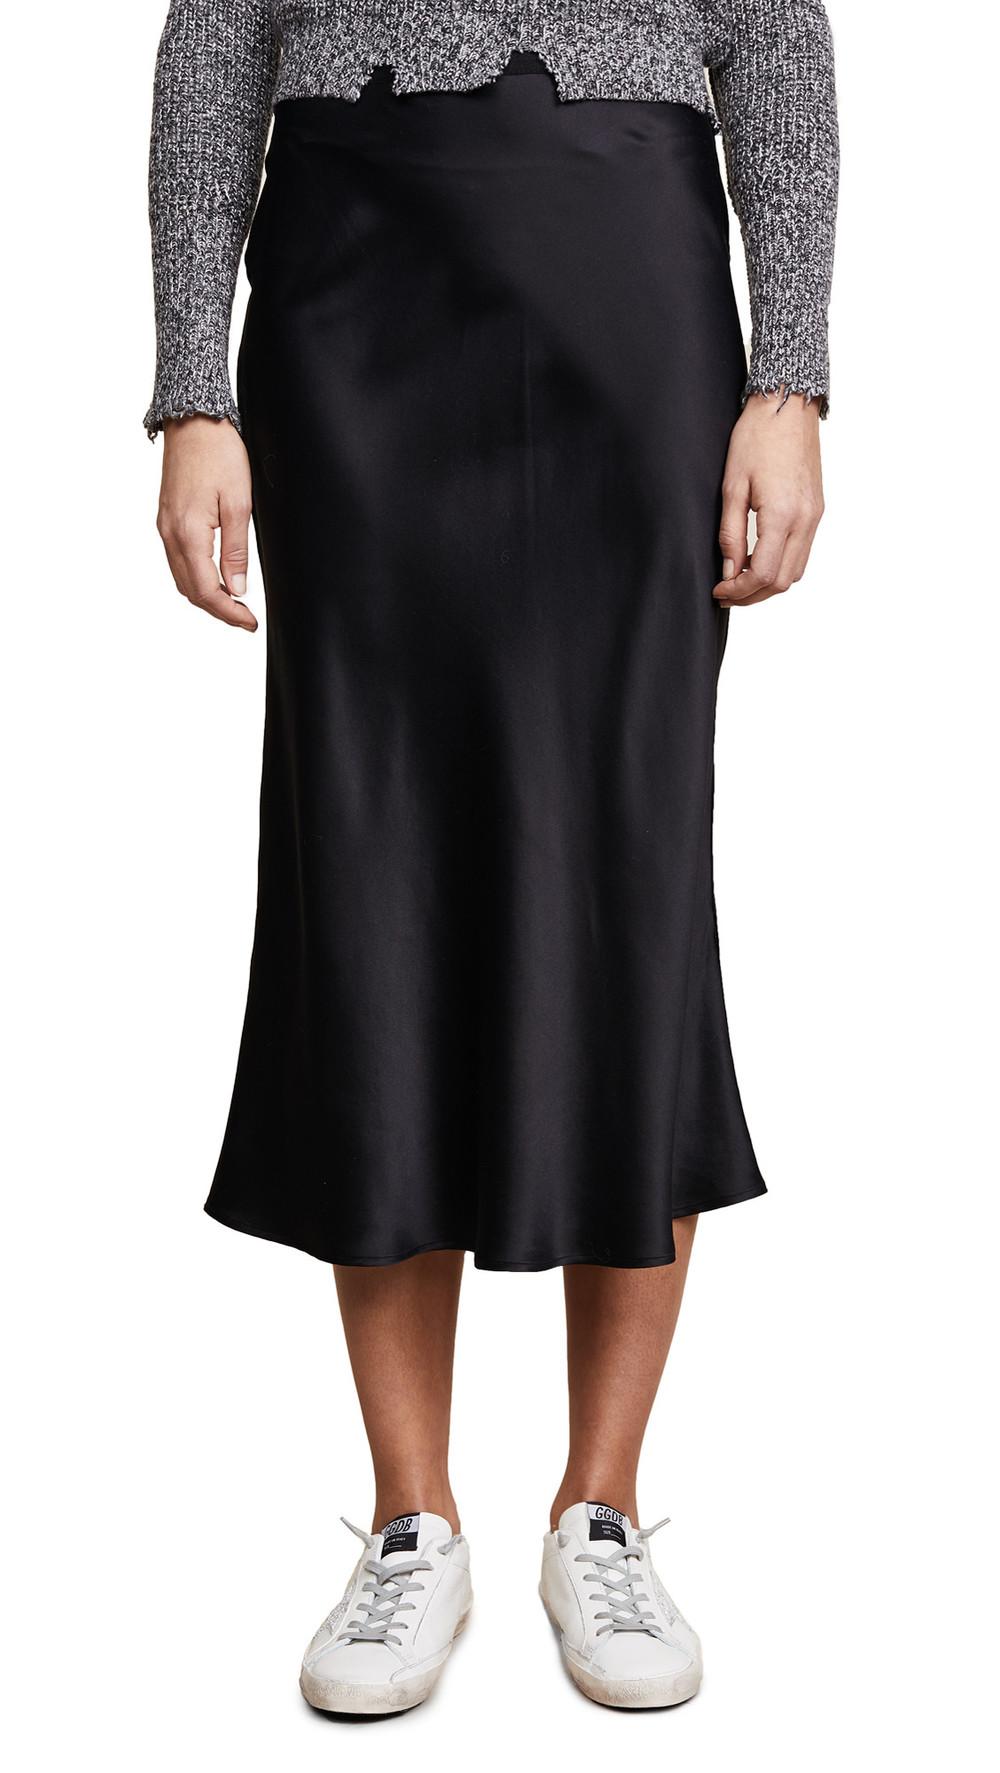 ANINE BING Bar Silk Skirt in black